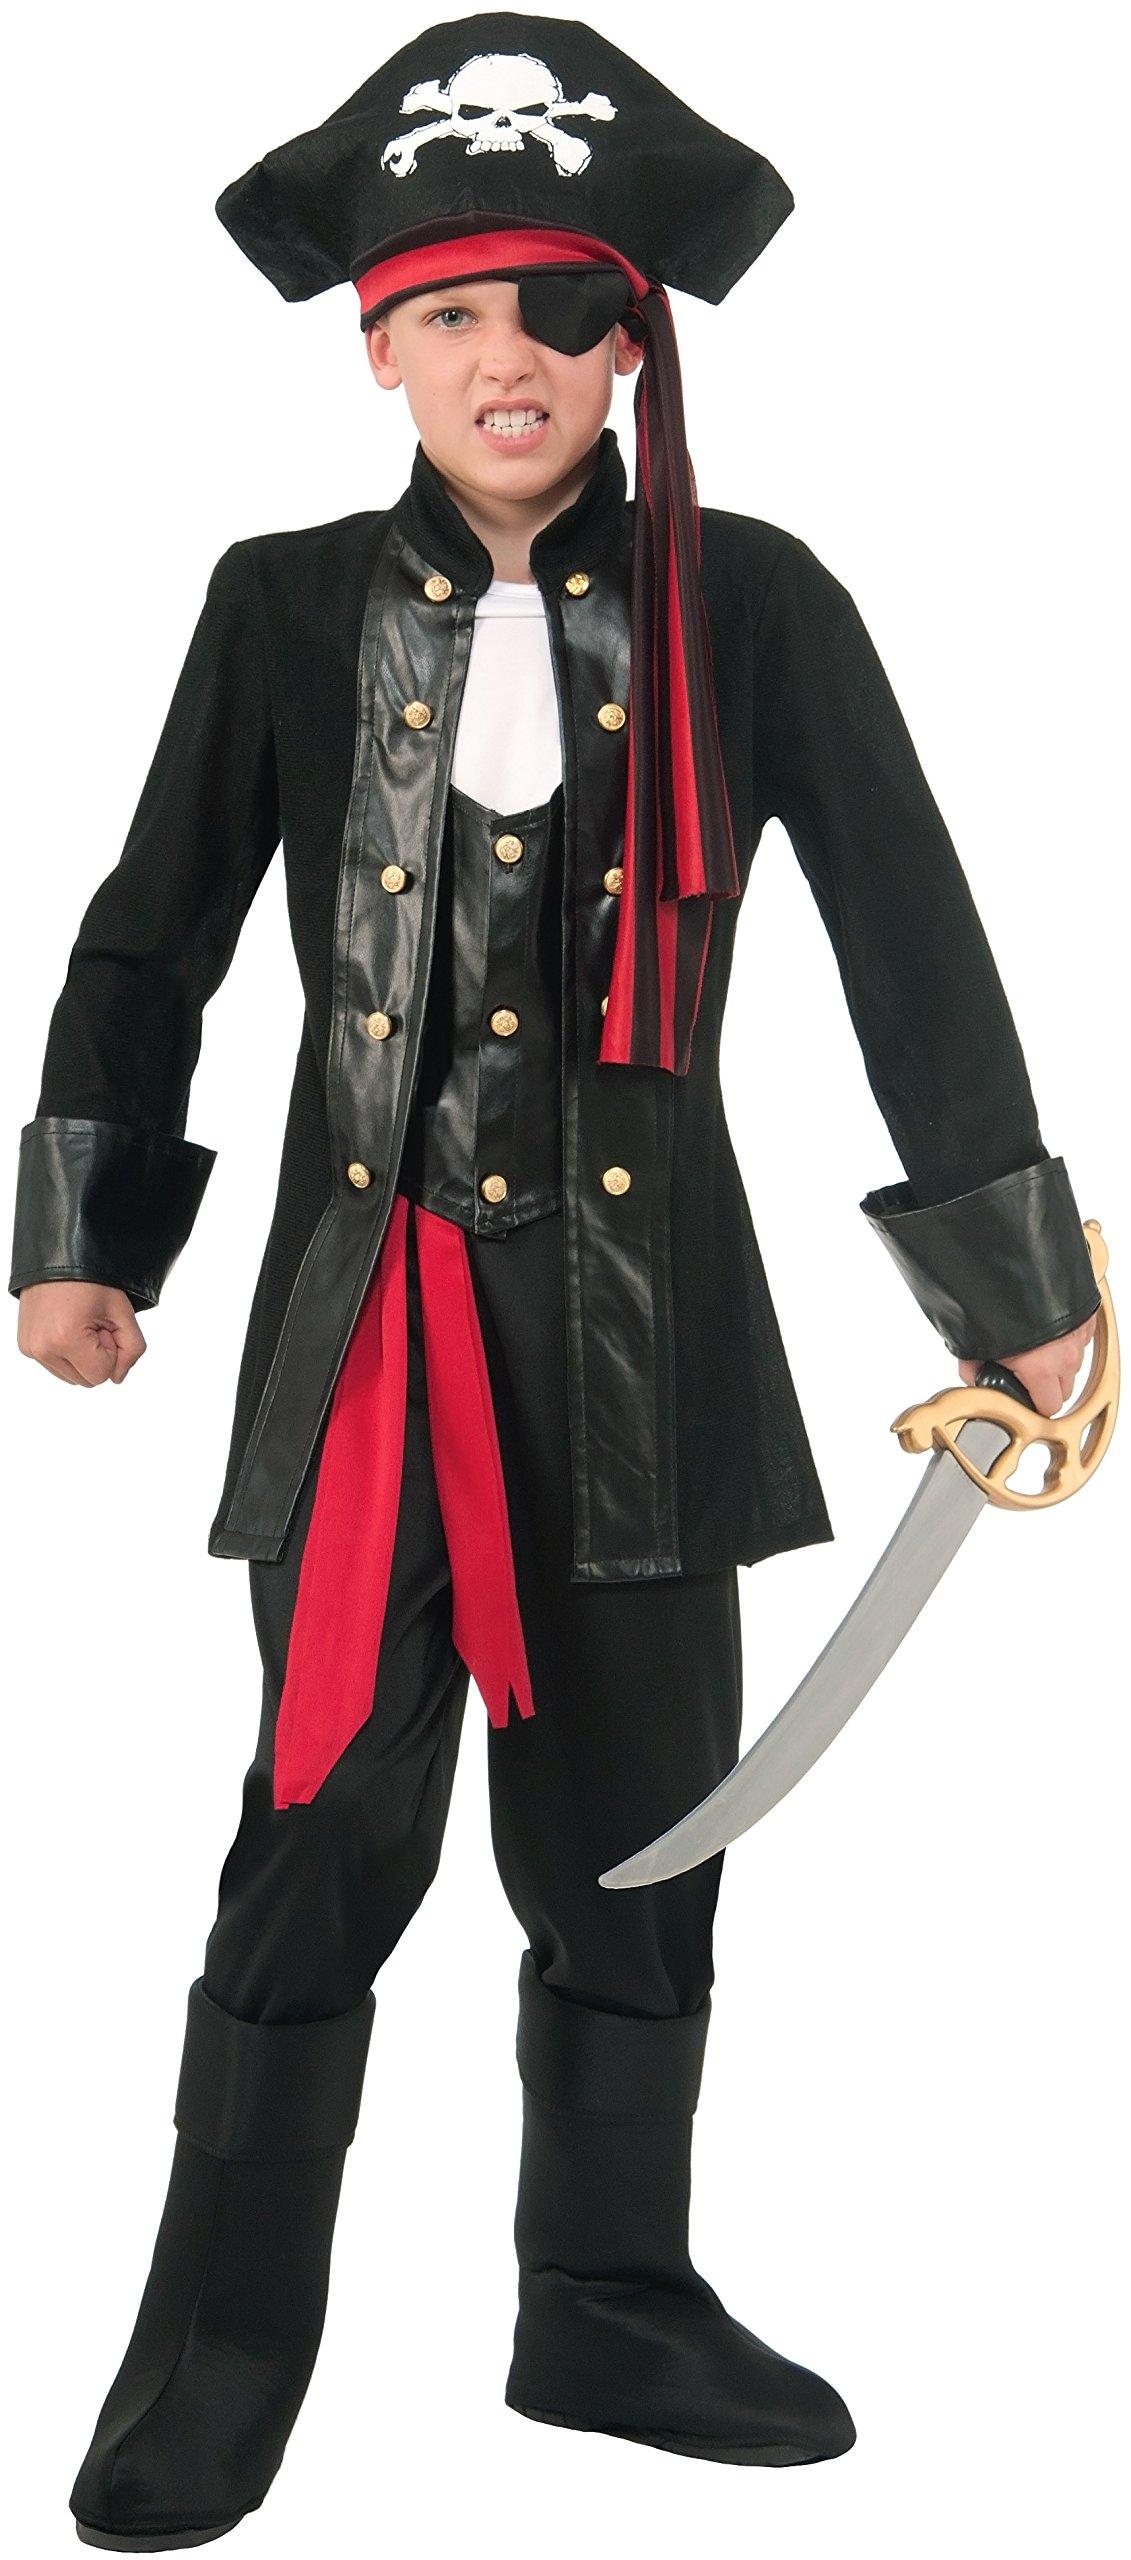 Forum Novelties Seven Seas Boys Pirate Costume (Medium 8-10)